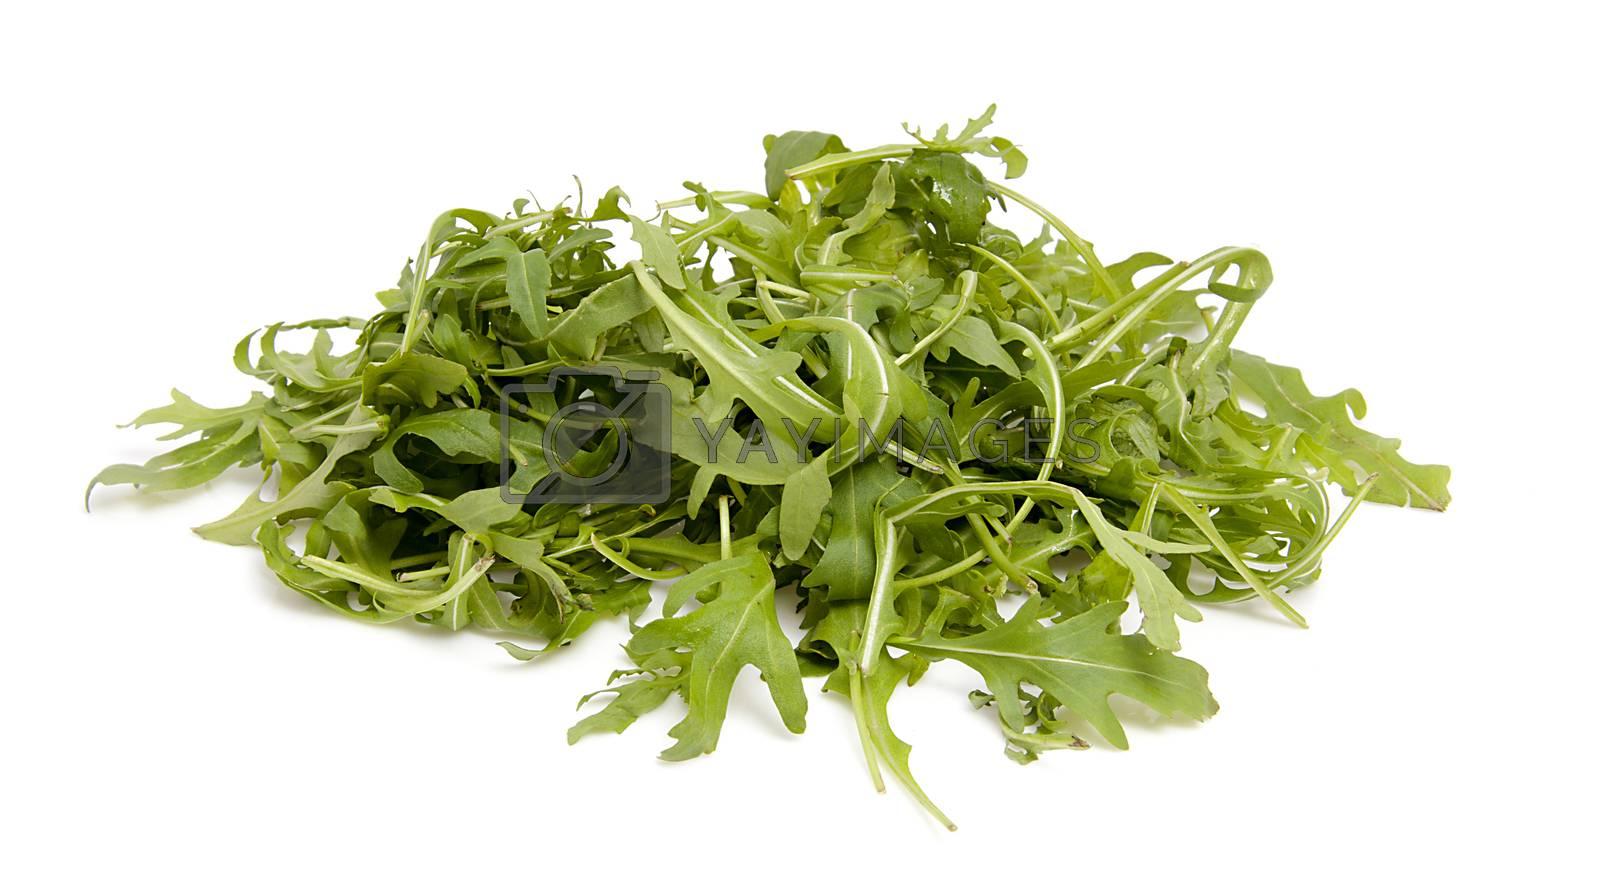 Pile of fresh Ruccola lettuce over white background